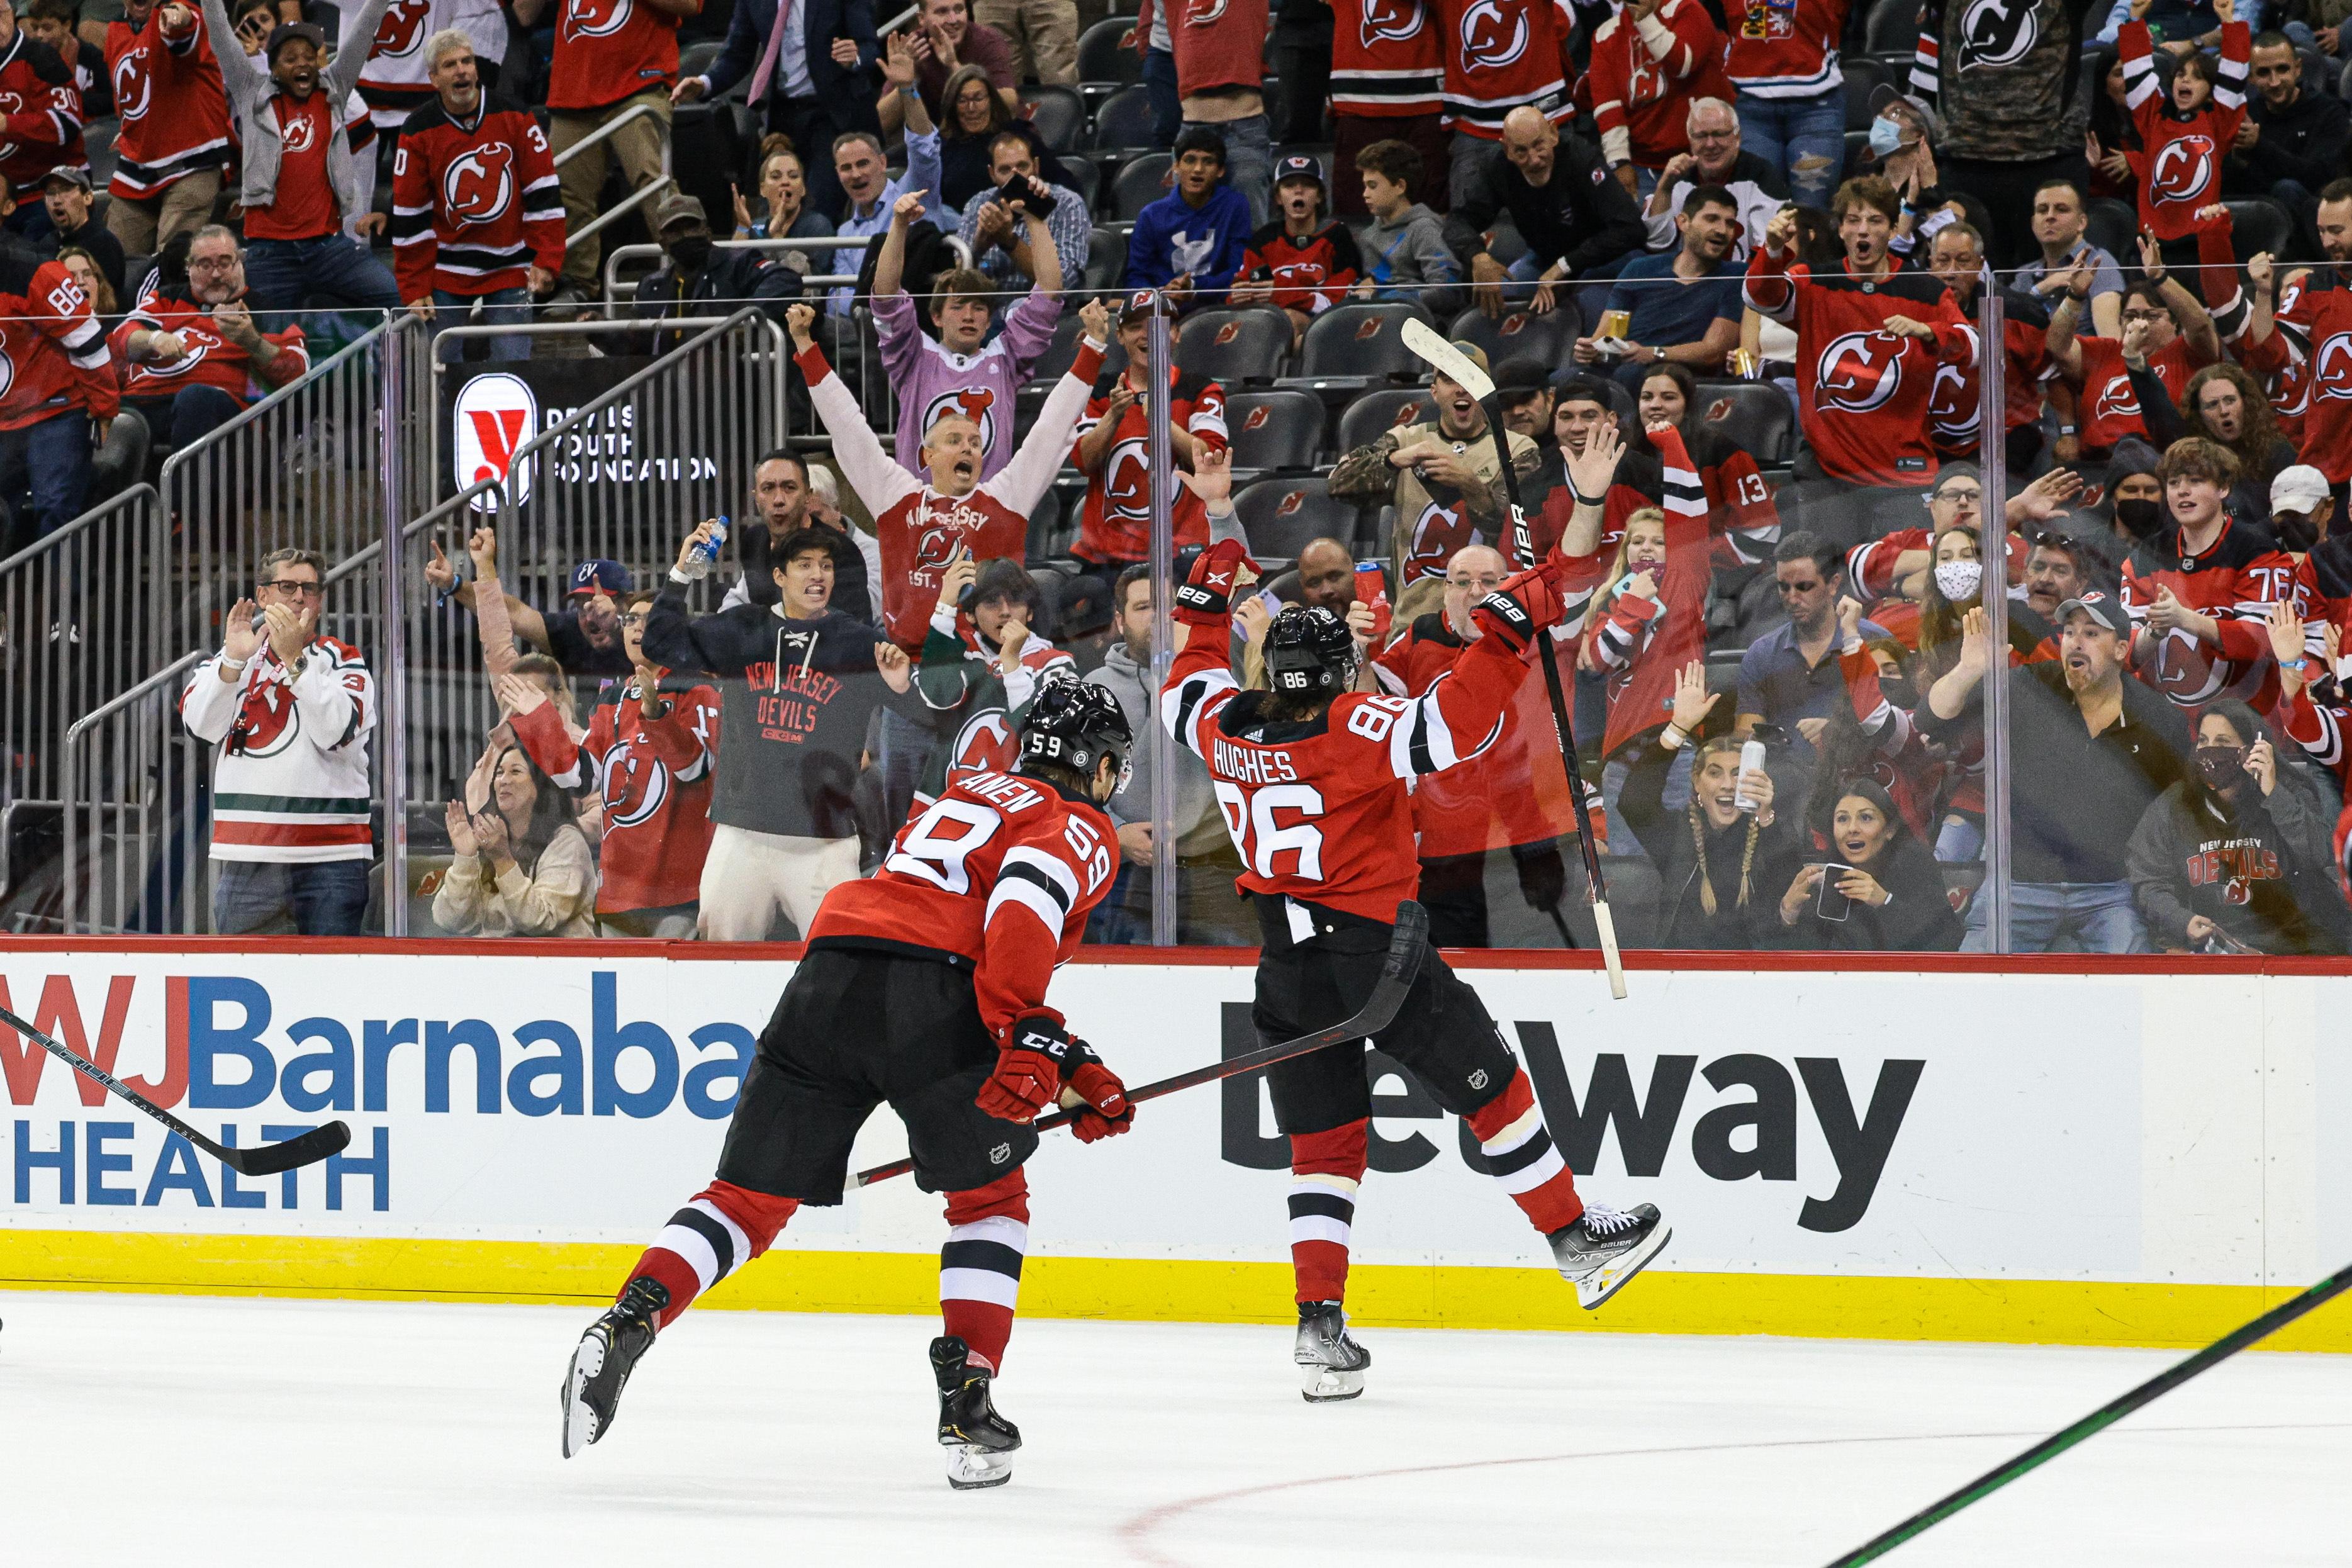 NHL: Chicago Blackhawks at New Jersey Devils